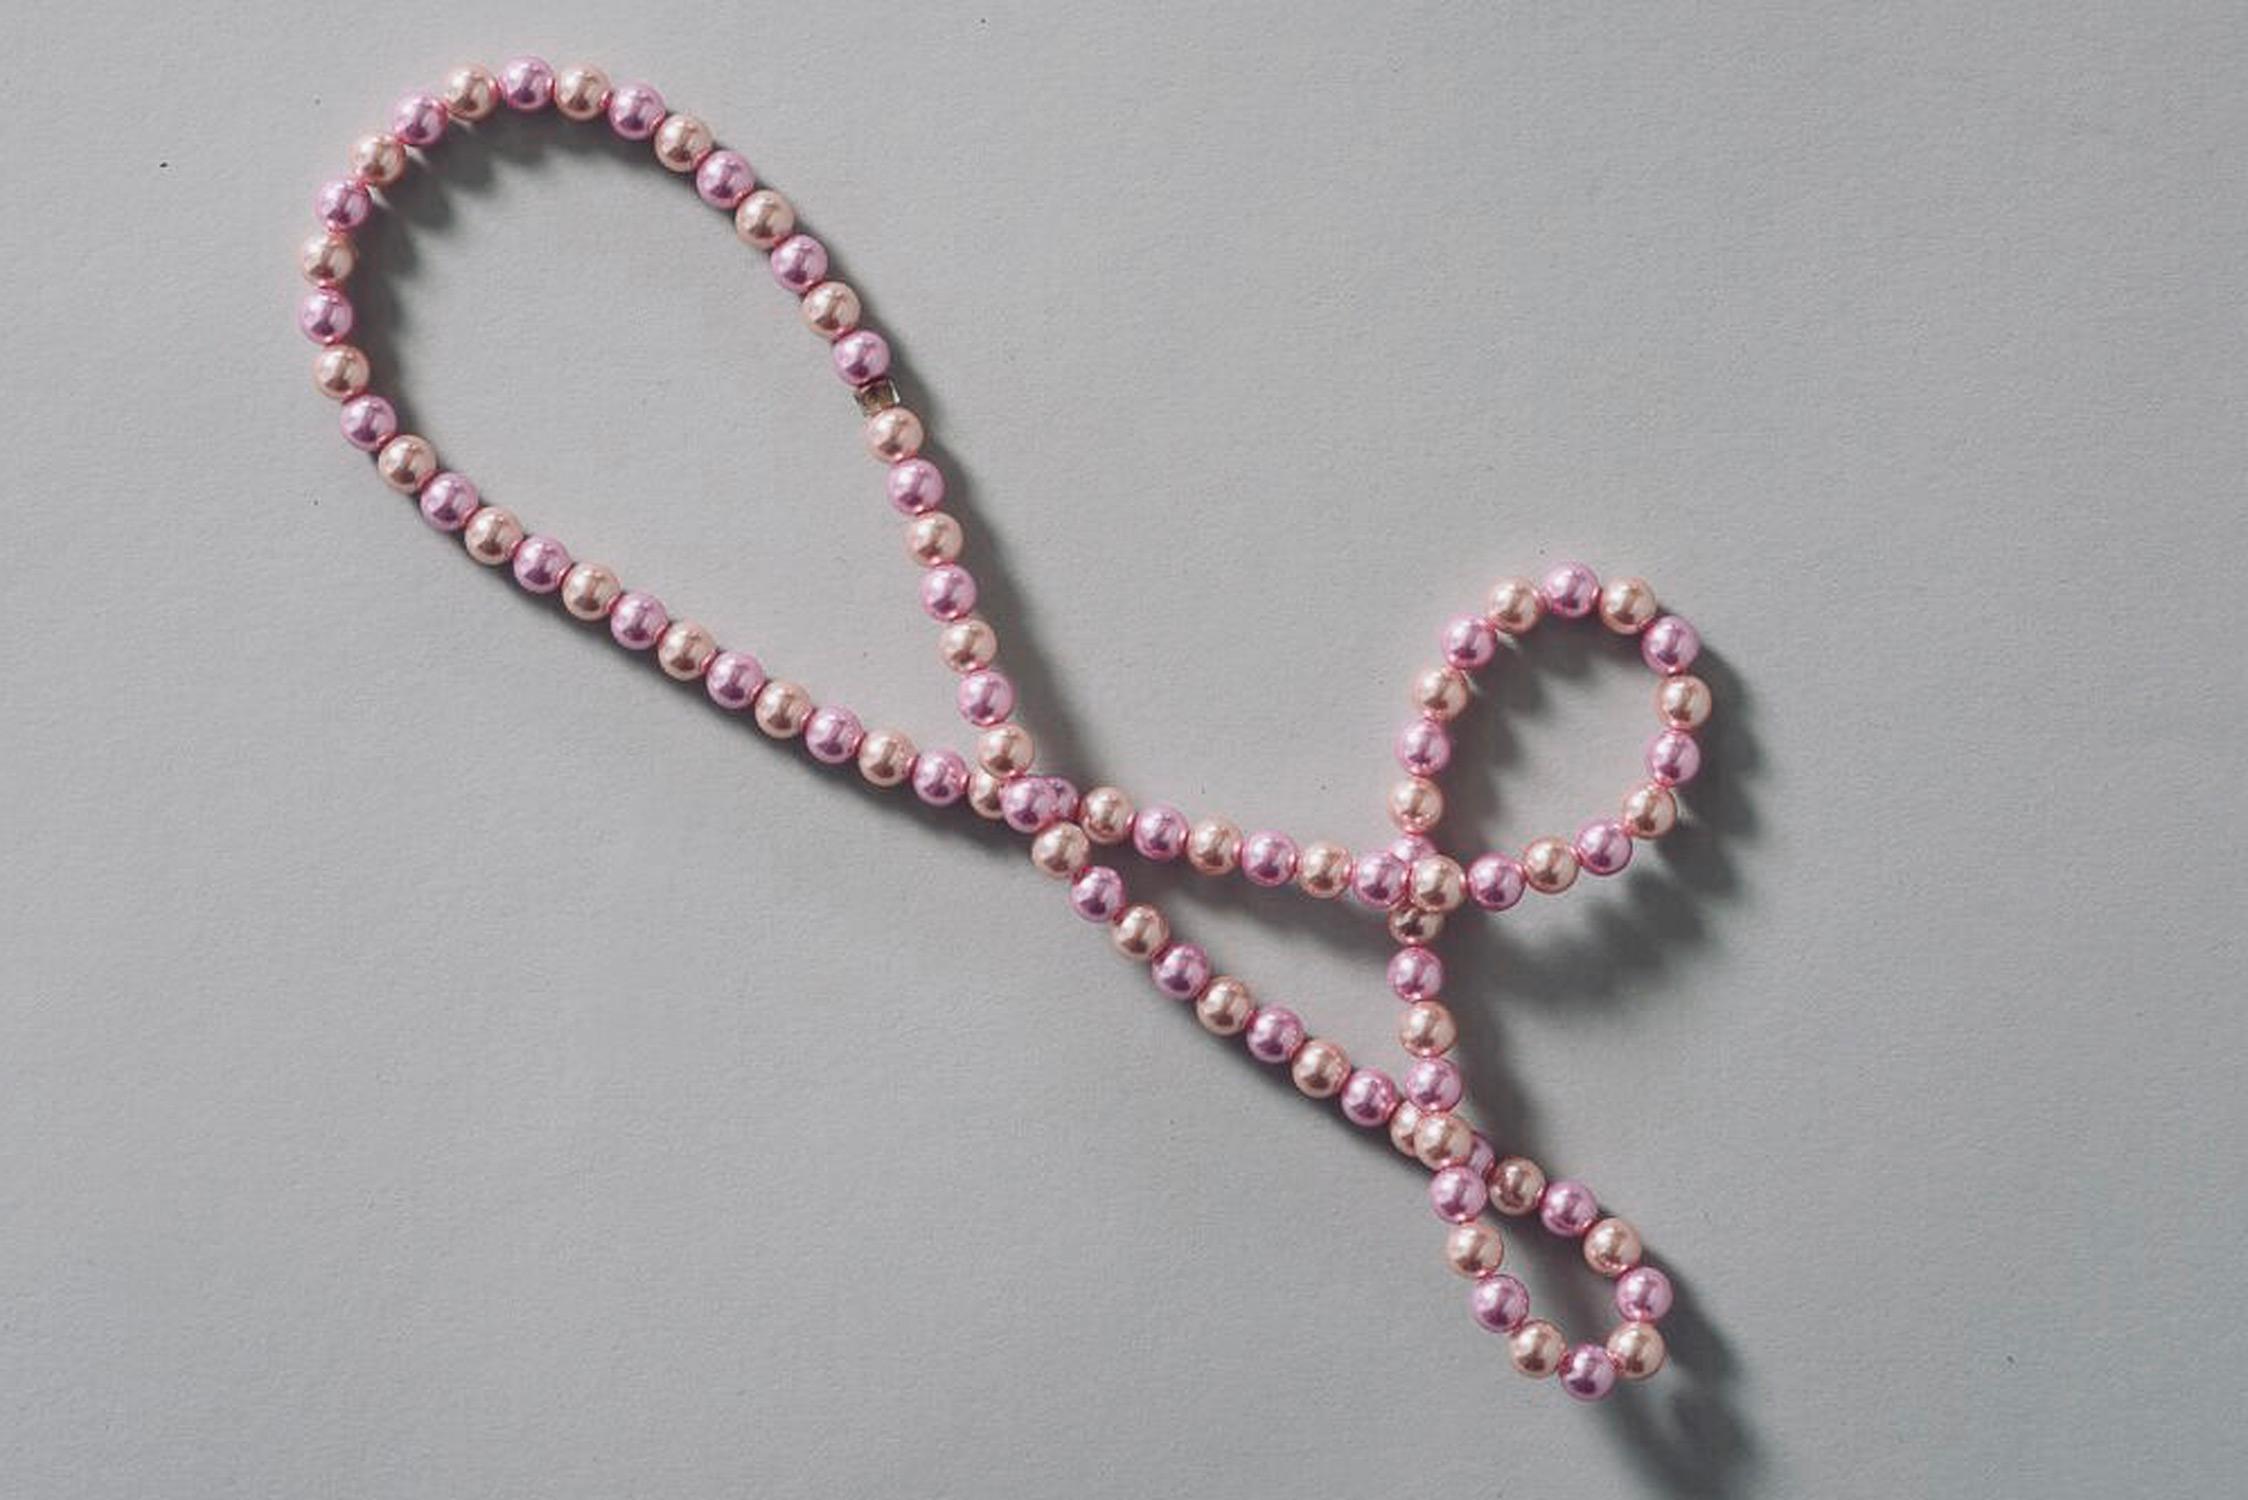 Rosa Macher Pearl Necklace Lilaa & Orange